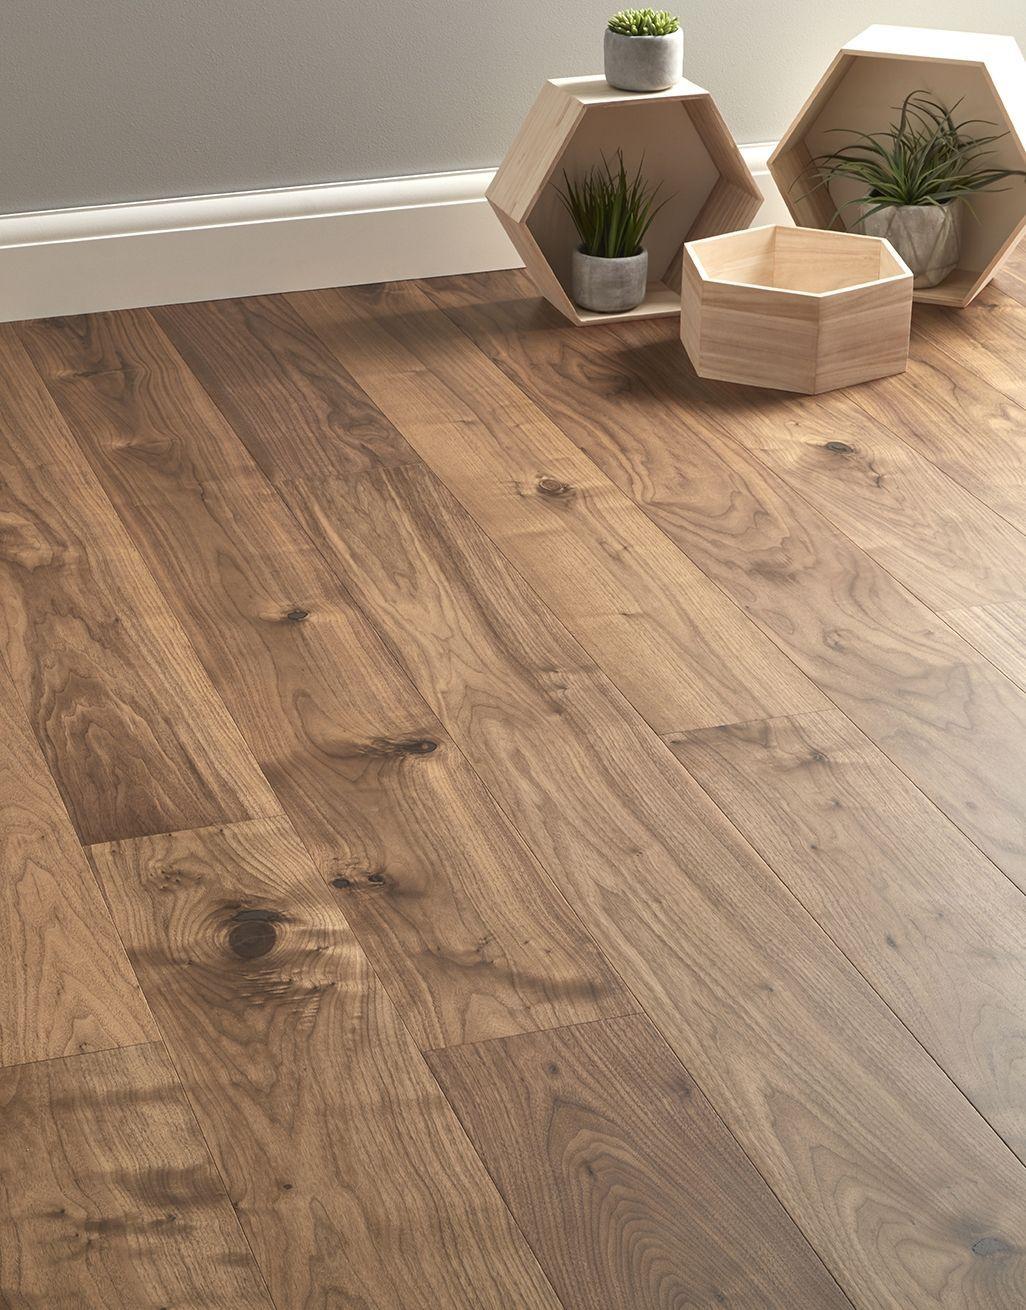 Prestige Black Walnut Oiled Engineered Wood Bodenbelag In 2020 Walnut Laminate Flooring Engineered Wood Floors Engineered Wood